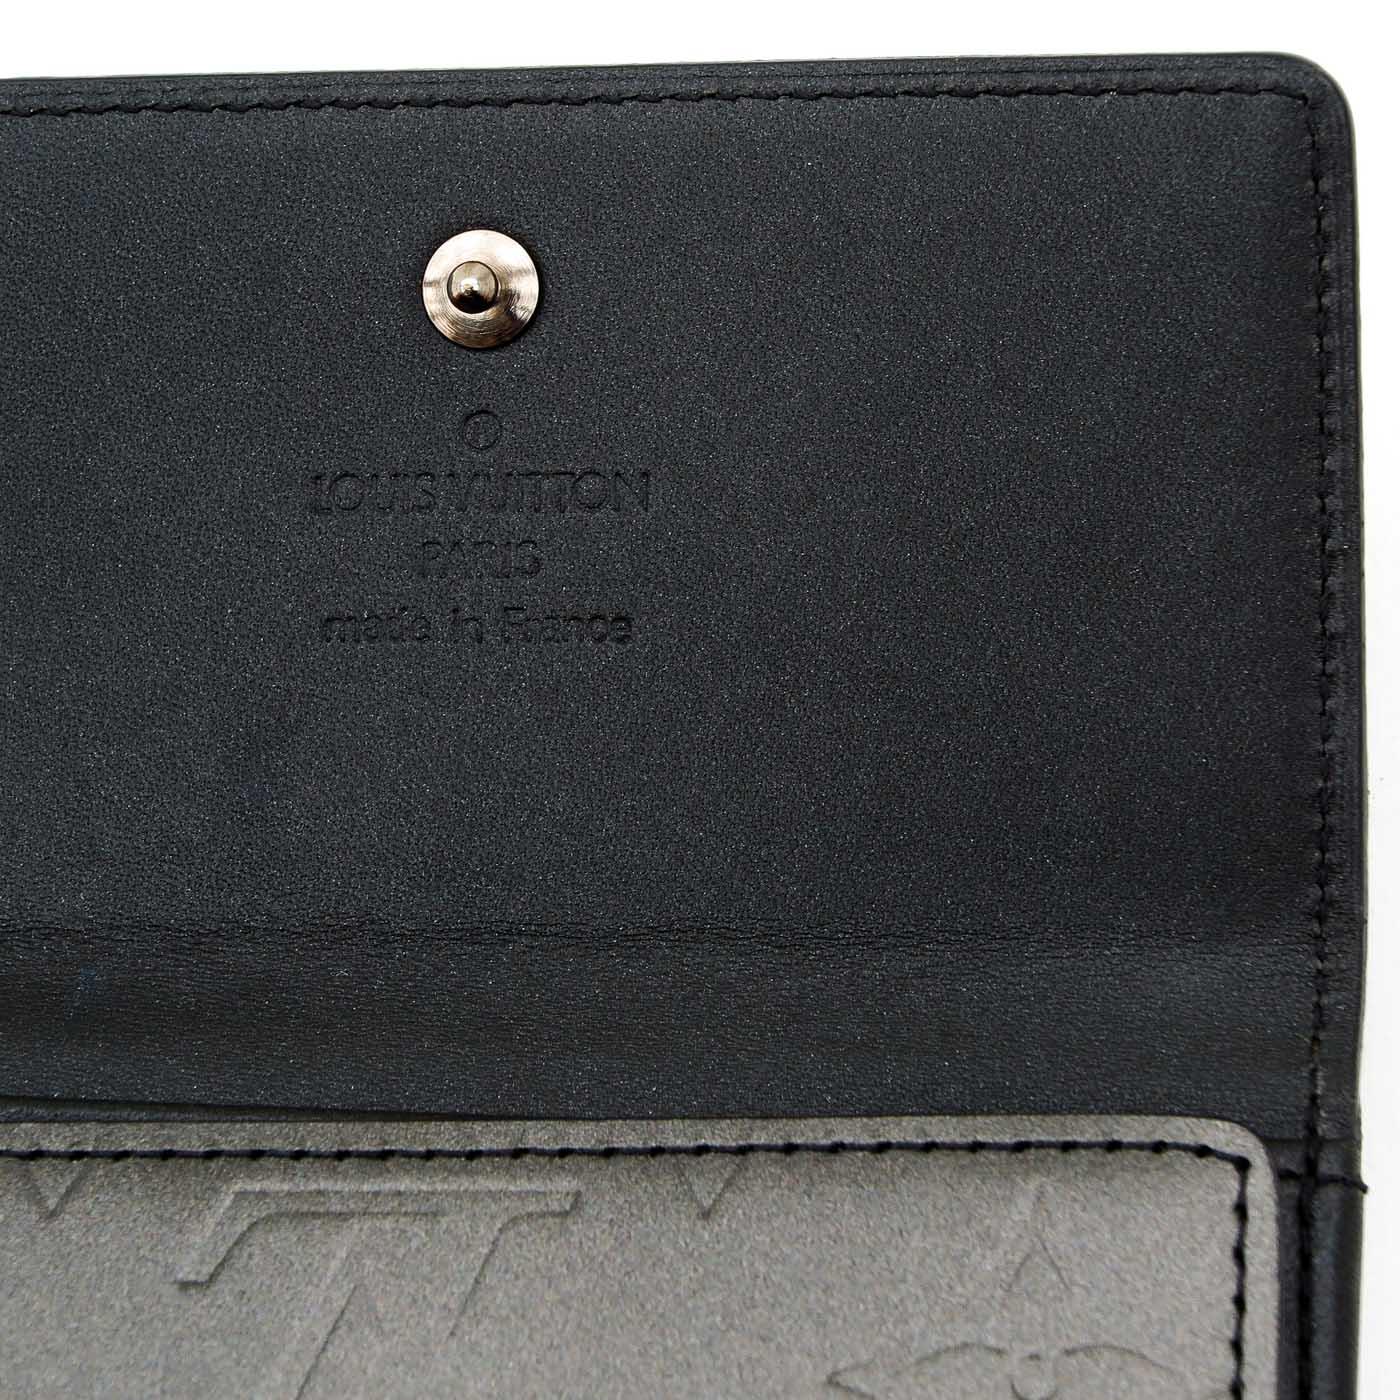 Lot 1269 - A Louis Vuitton Wallet